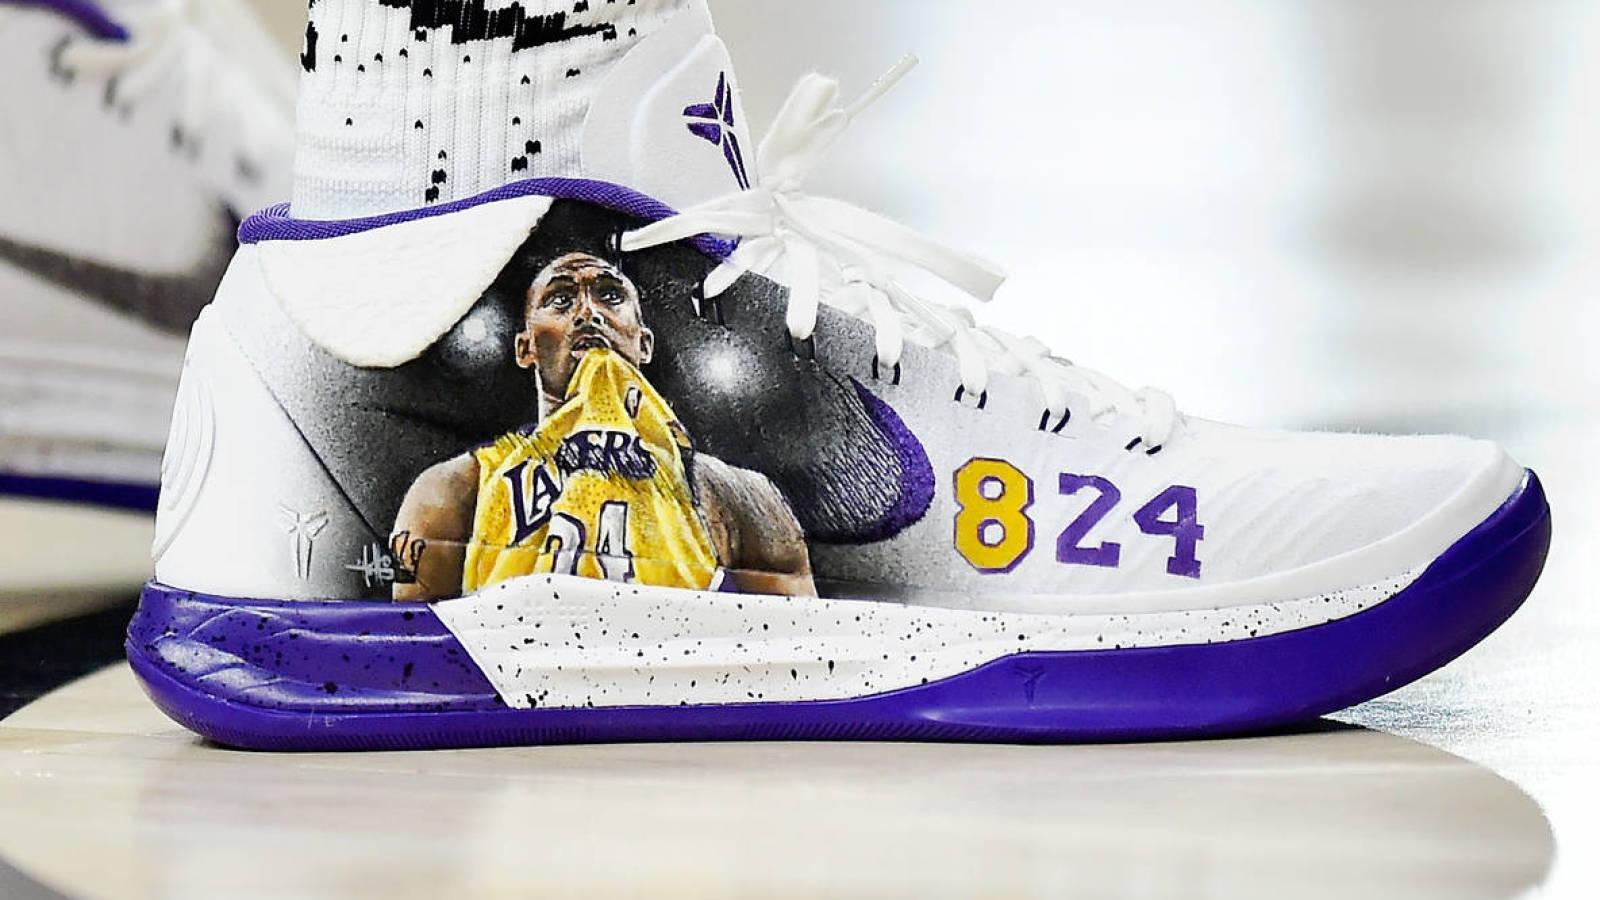 Derretido reducir Contable  Report: Kobe was planning to start his own shoe brand   Yardbarker